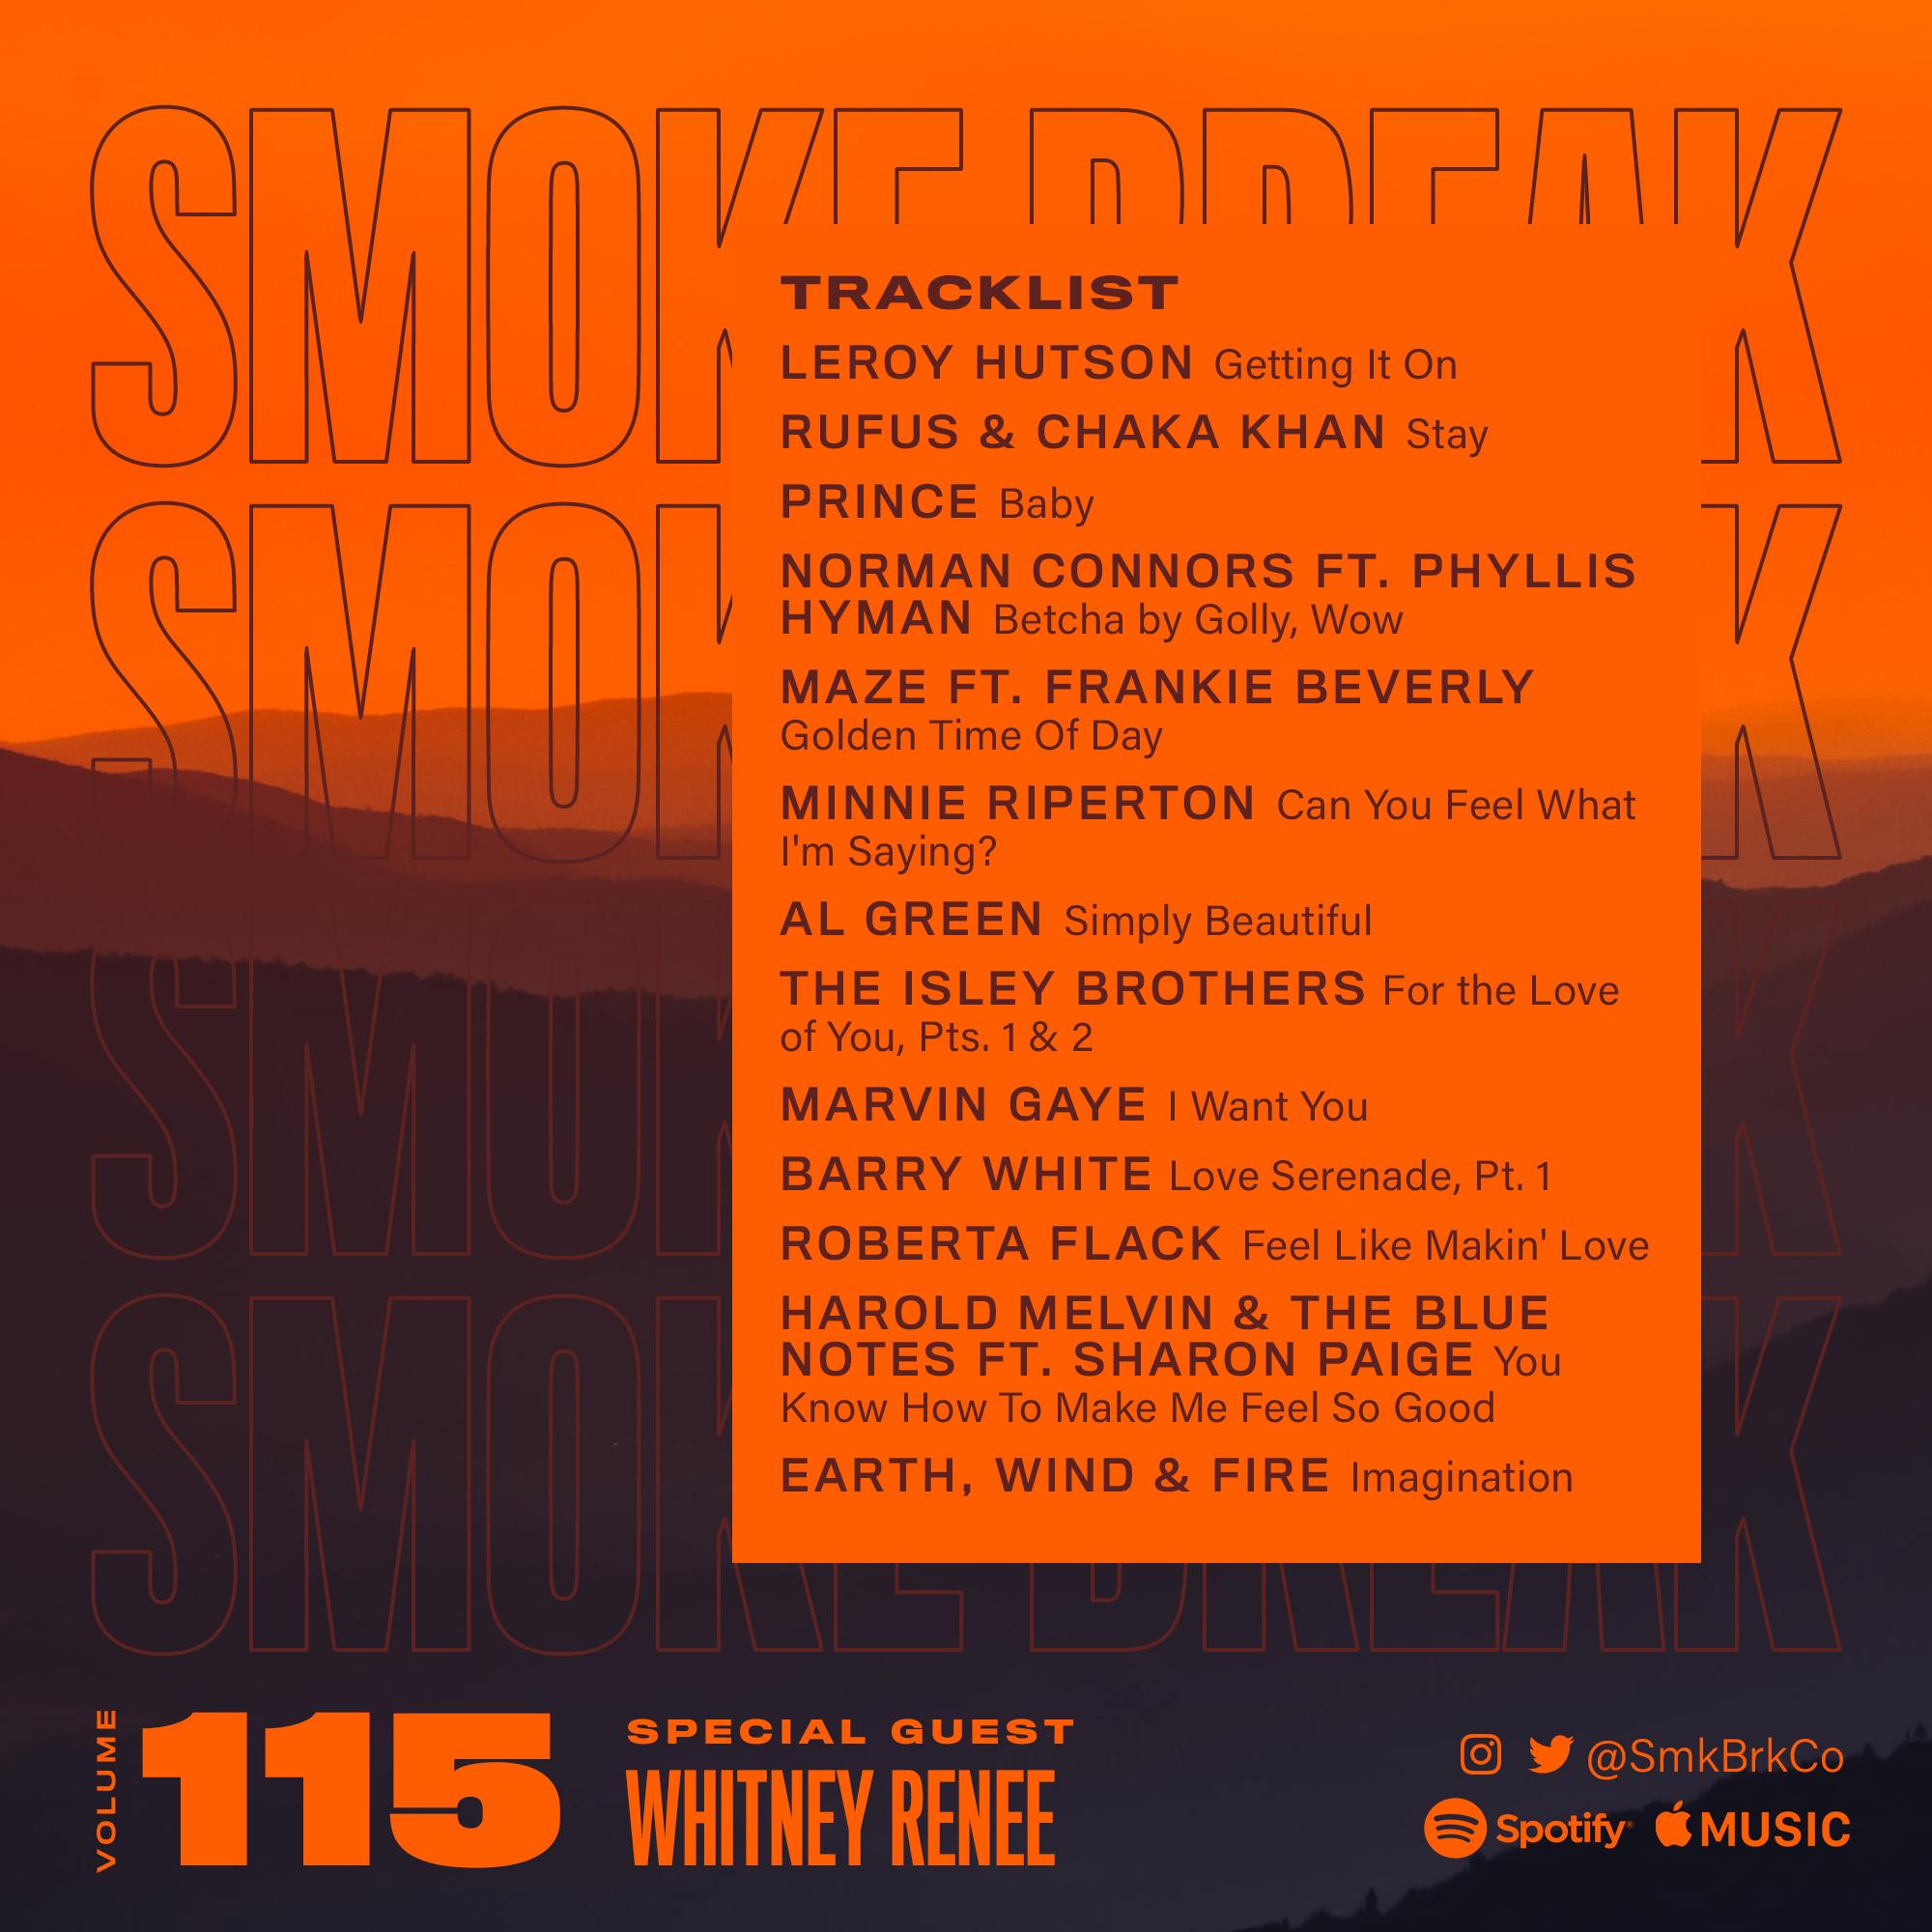 SMK BRK playlist vol 115 back cover